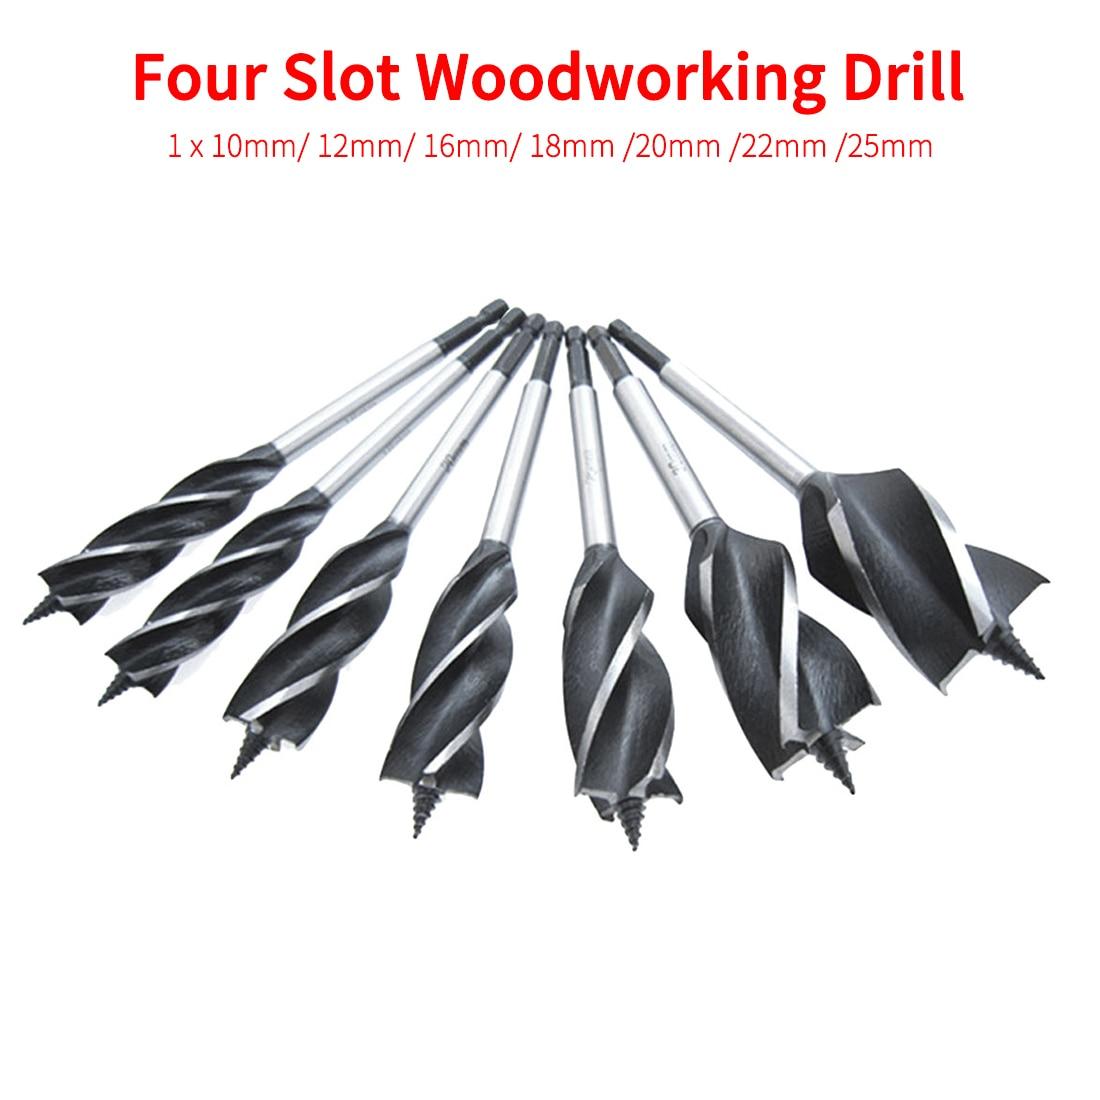 Twist Drill Bit Set Wood Fast Cut Auger Carpenter Joiner Tool Drill Bit For Drawer/ Door Lock/ Woodworking Hex Shank 10mm-25mm